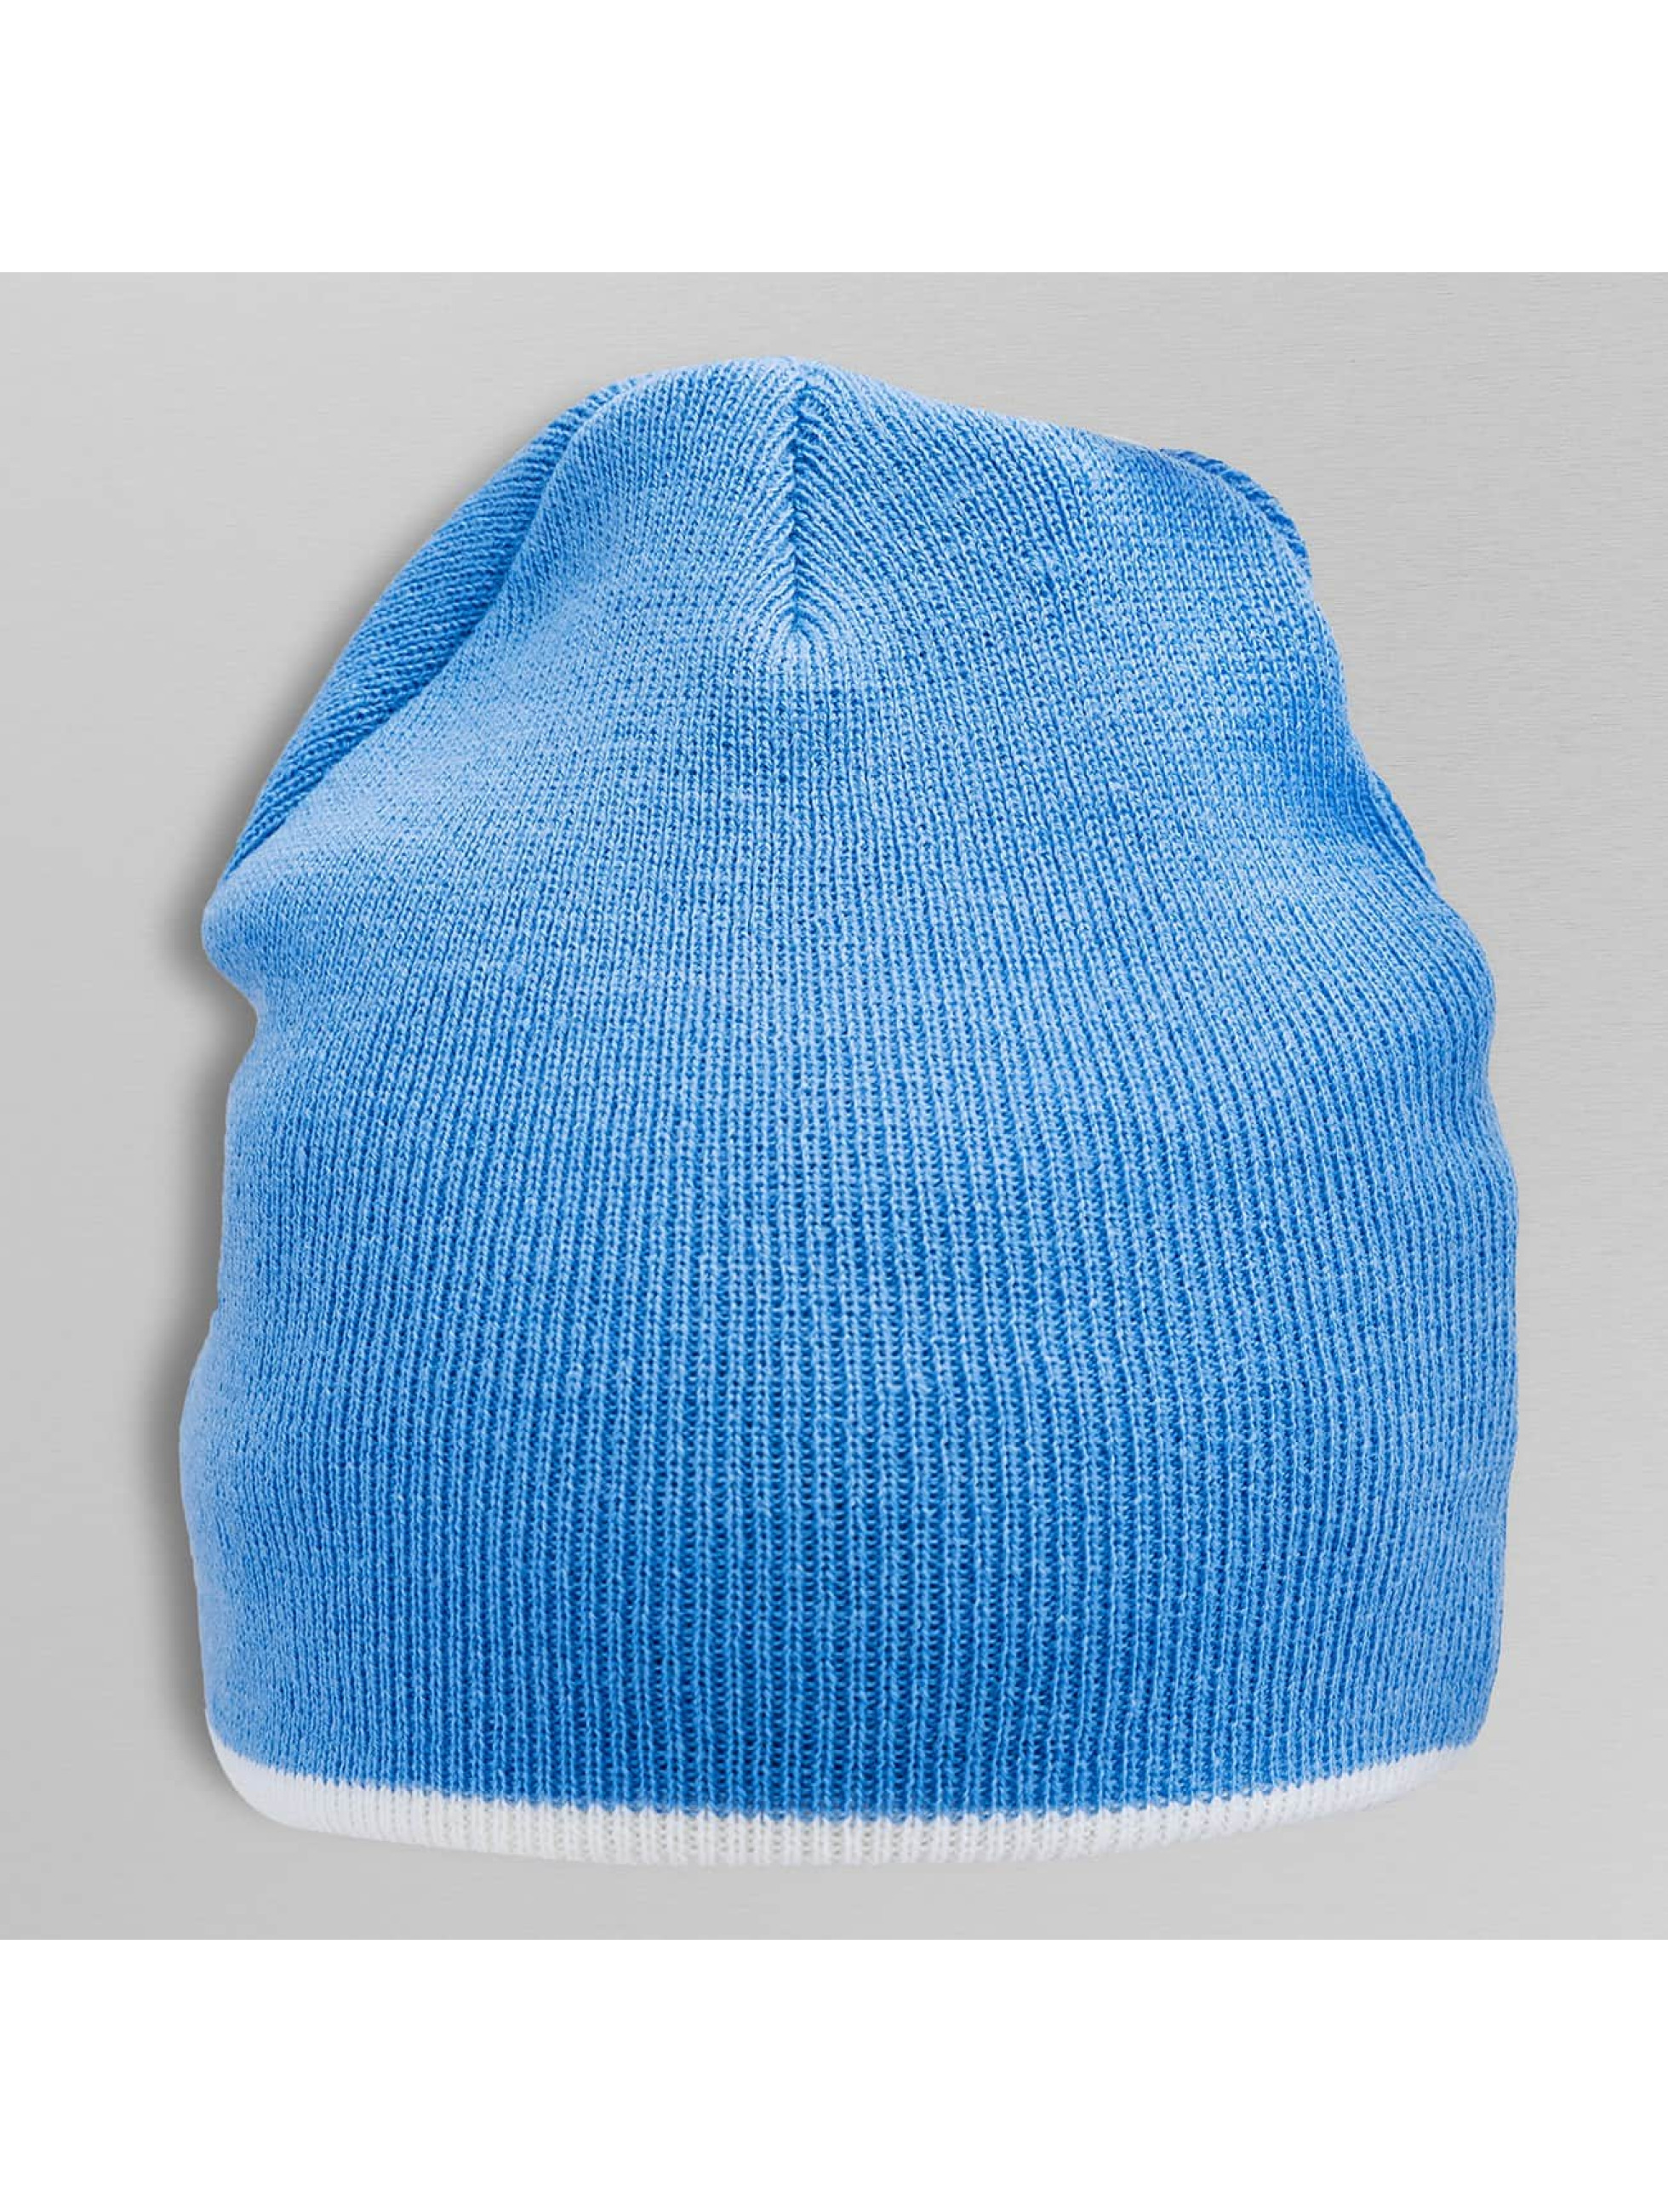 Cap Crony шляпа Single Striped синий